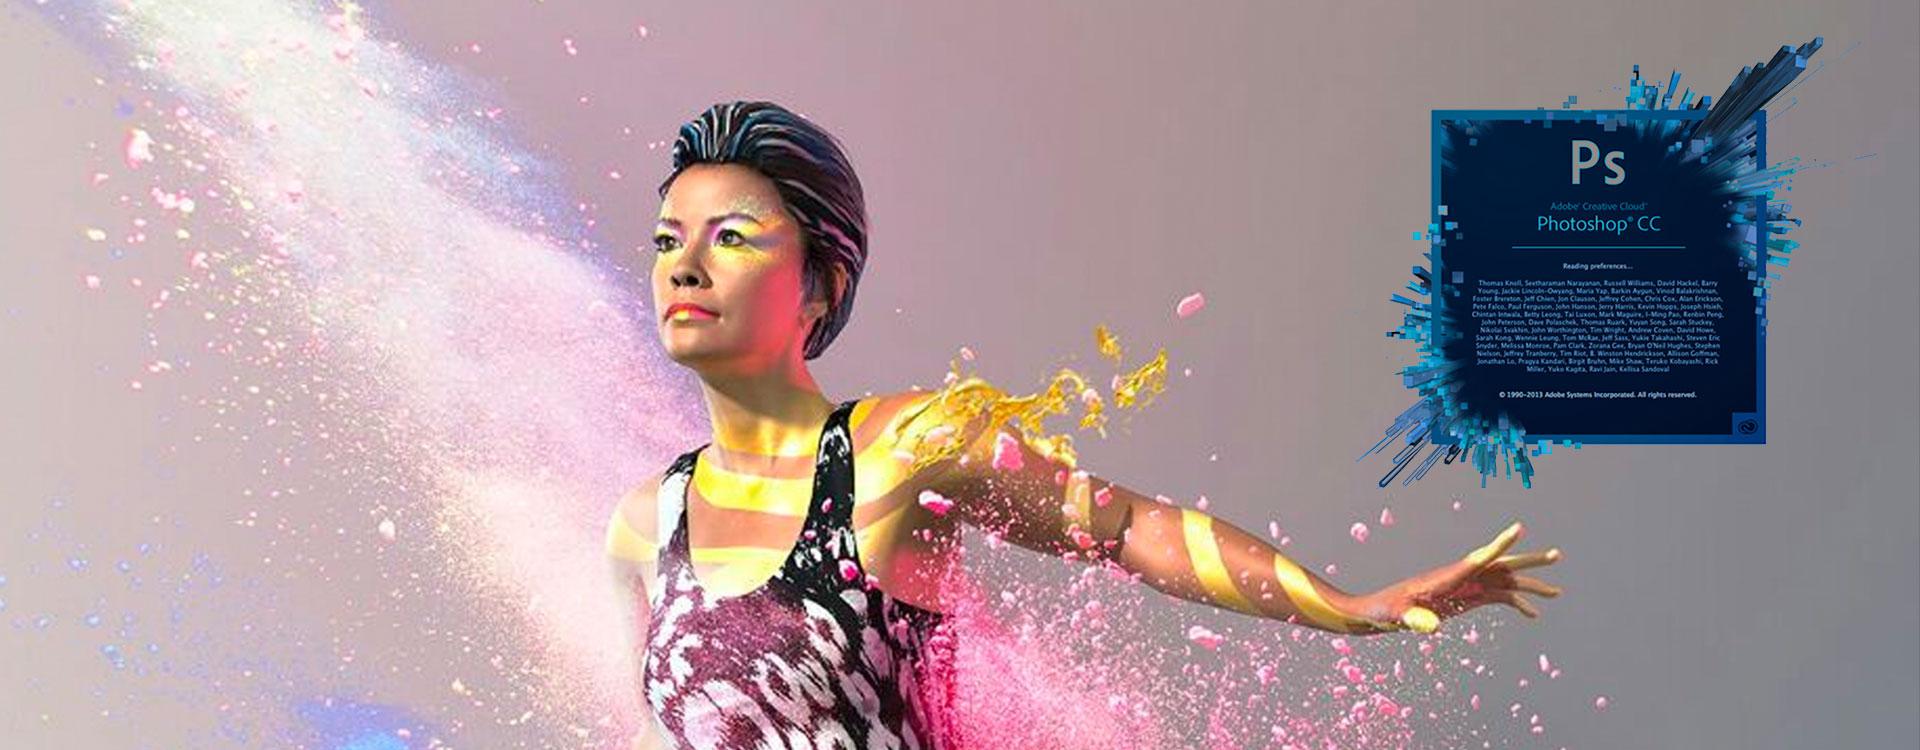 Adobe Fuse & Photoshop 3D